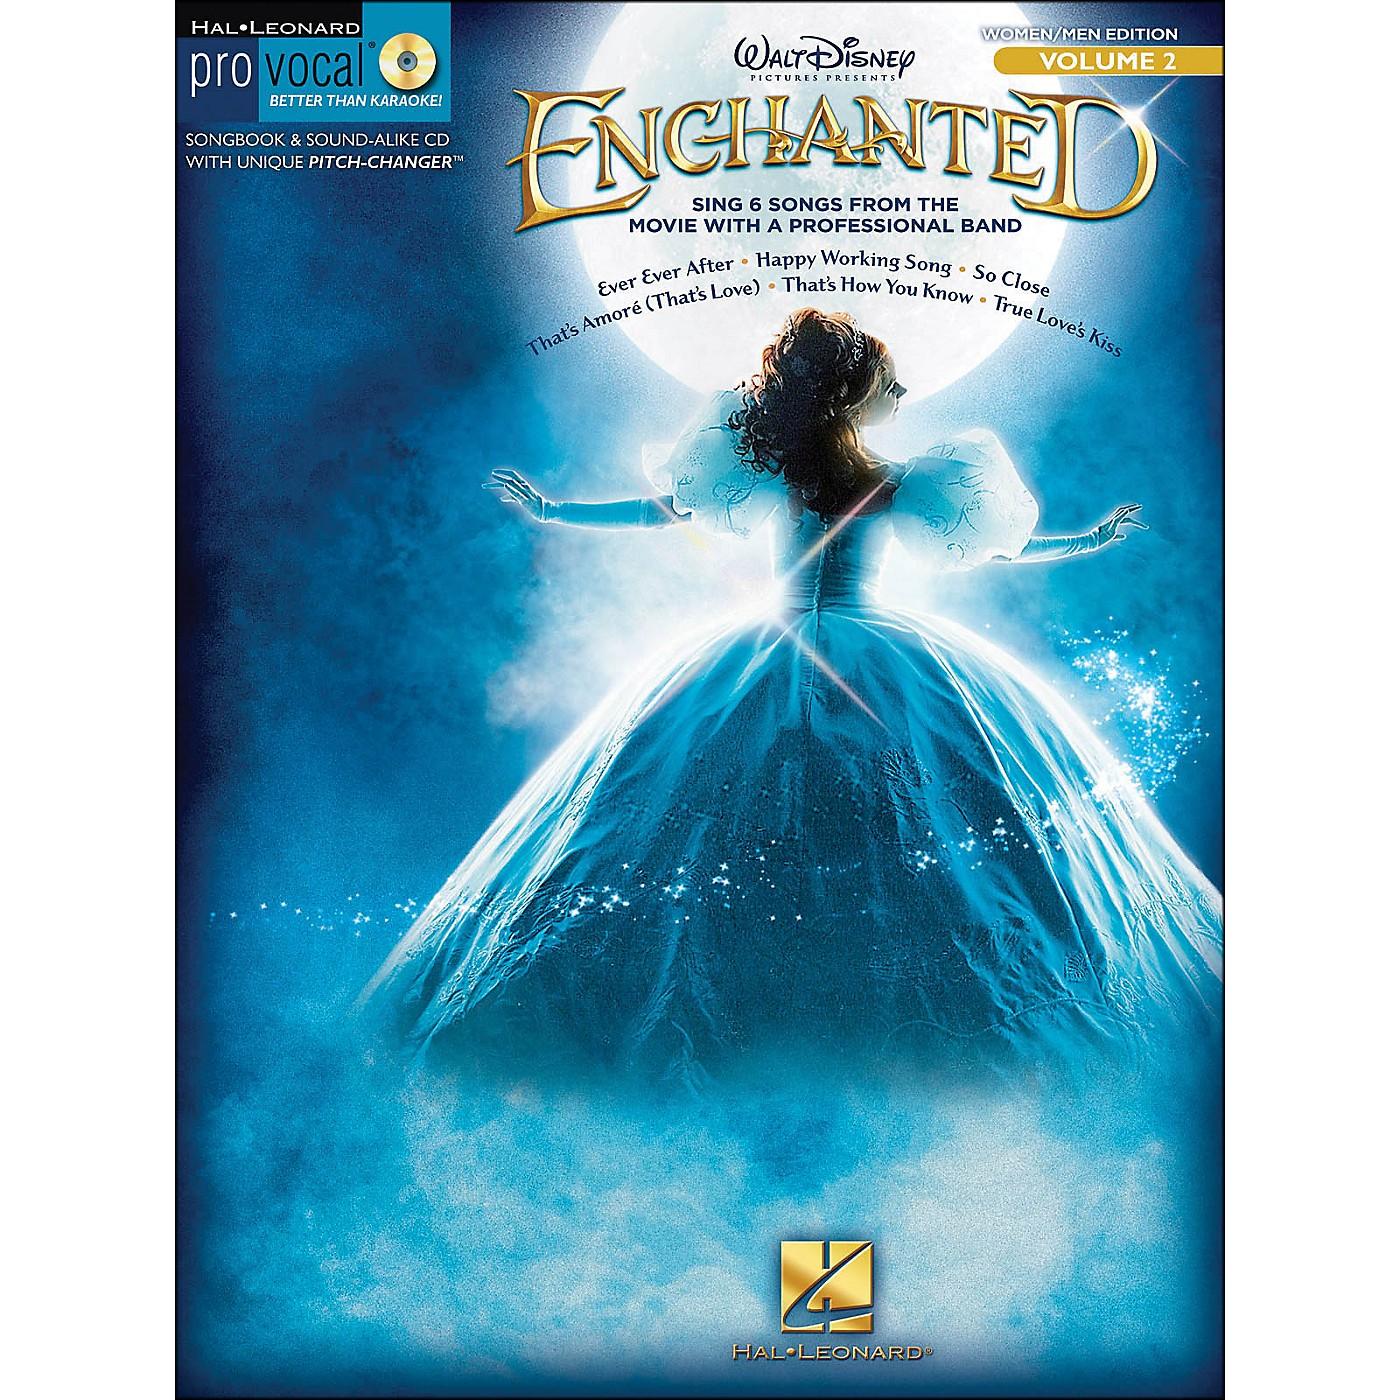 Hal Leonard Enchanted - Pro Vocal Songbook & CD for Women/Men Volume 2 thumbnail